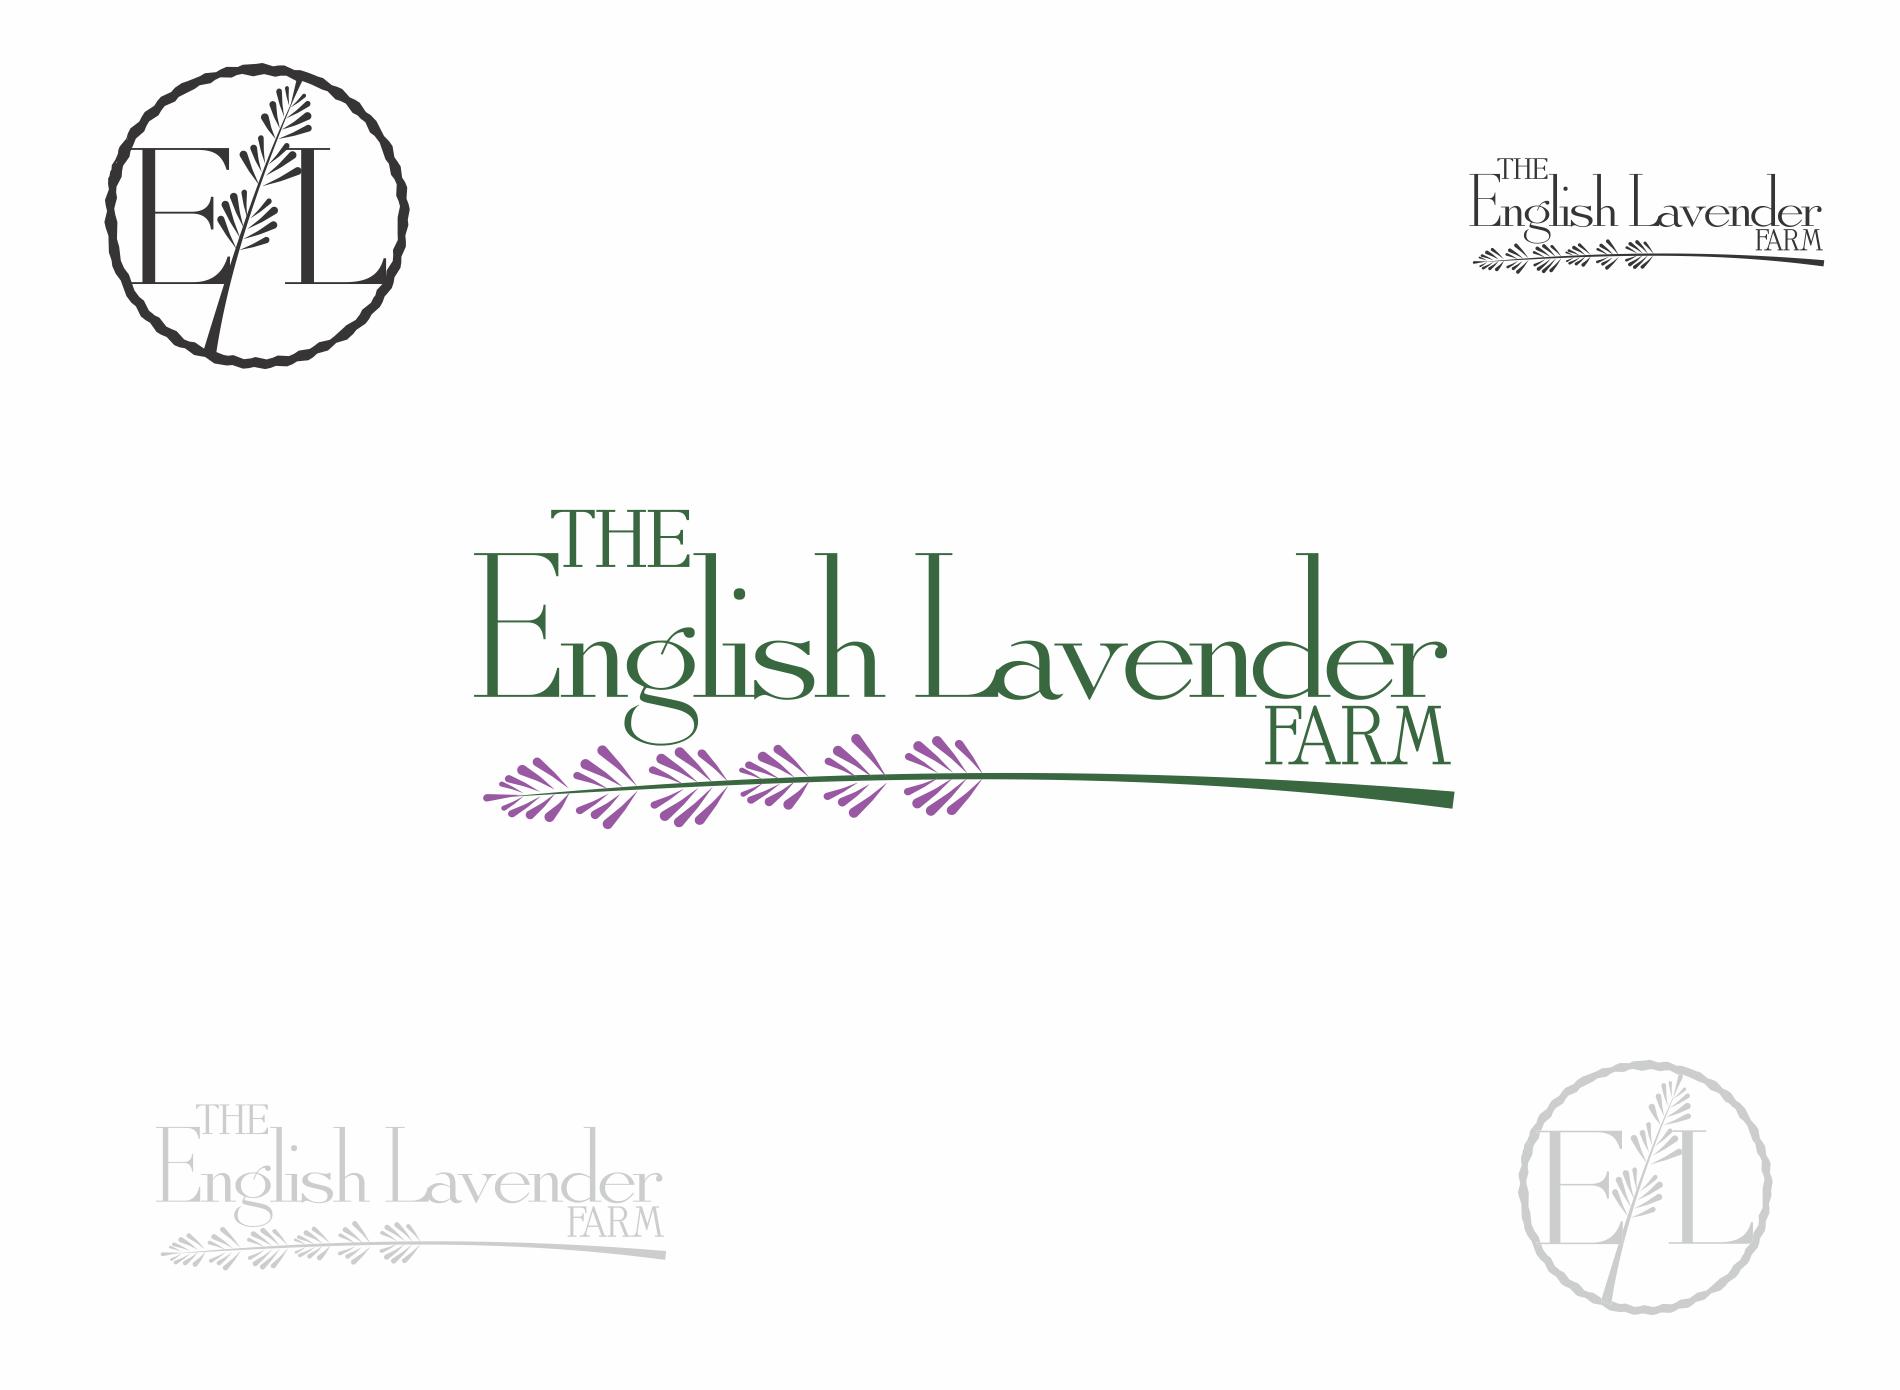 logo for The English Lavender Farm